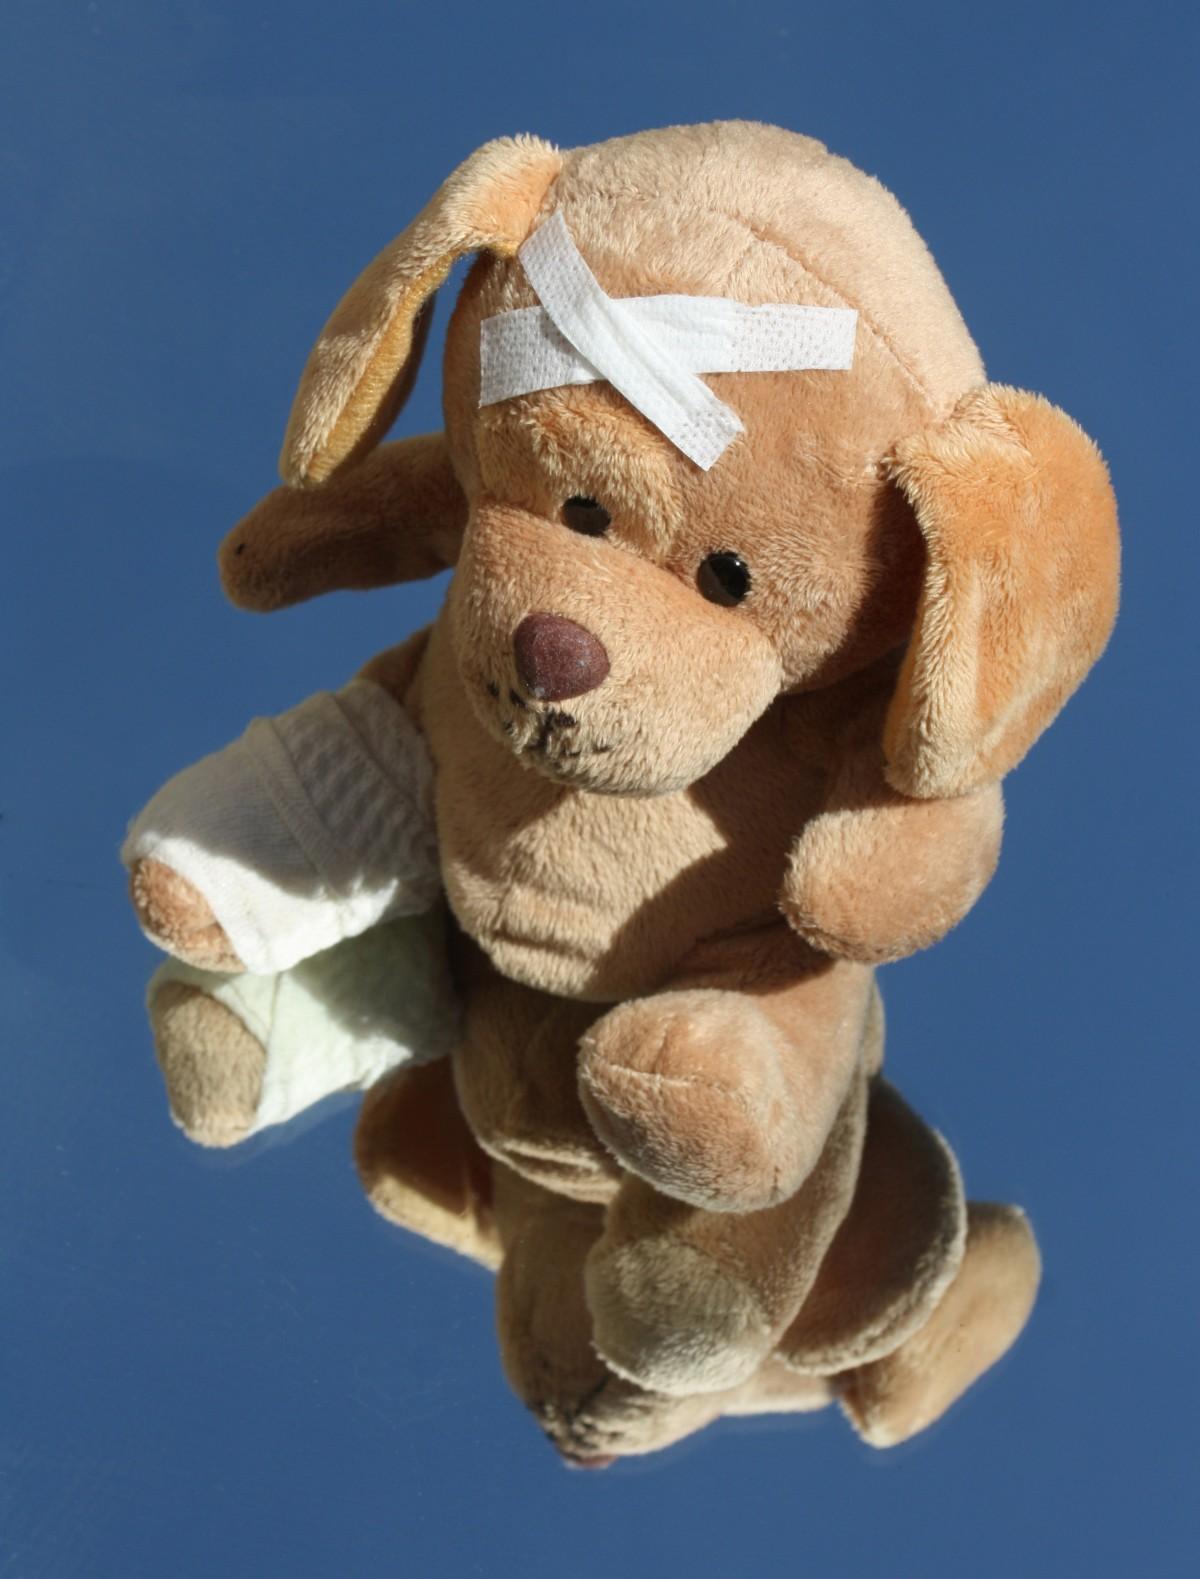 Free Images Dog Leg Arm Flowers Teddy Bear Product